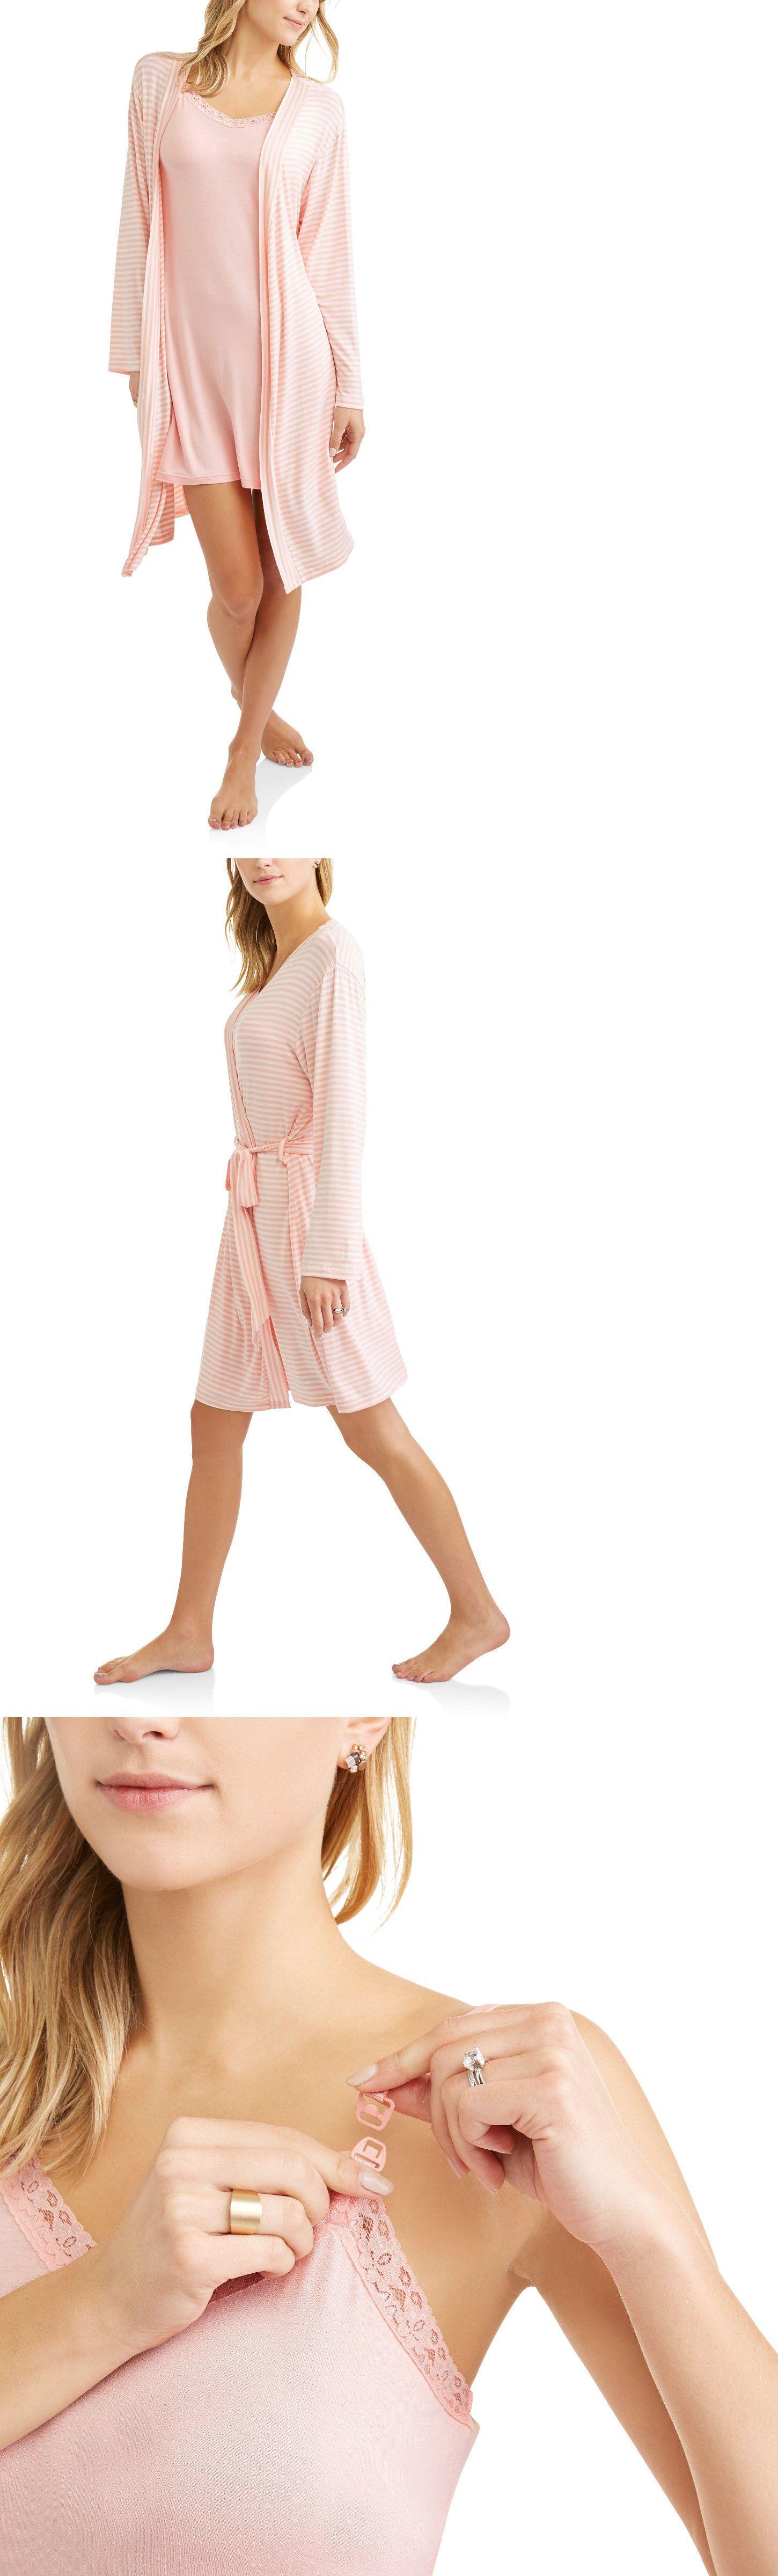 9bda5829c15 Sleepwear 15755  Nurture By Lamaze Maternity 2-Piece Nursing Chemise And Robe  Set -  BUY IT NOW ONLY   24.99 on  eBay  sleepwear  nurture  lamaze   maternity ...